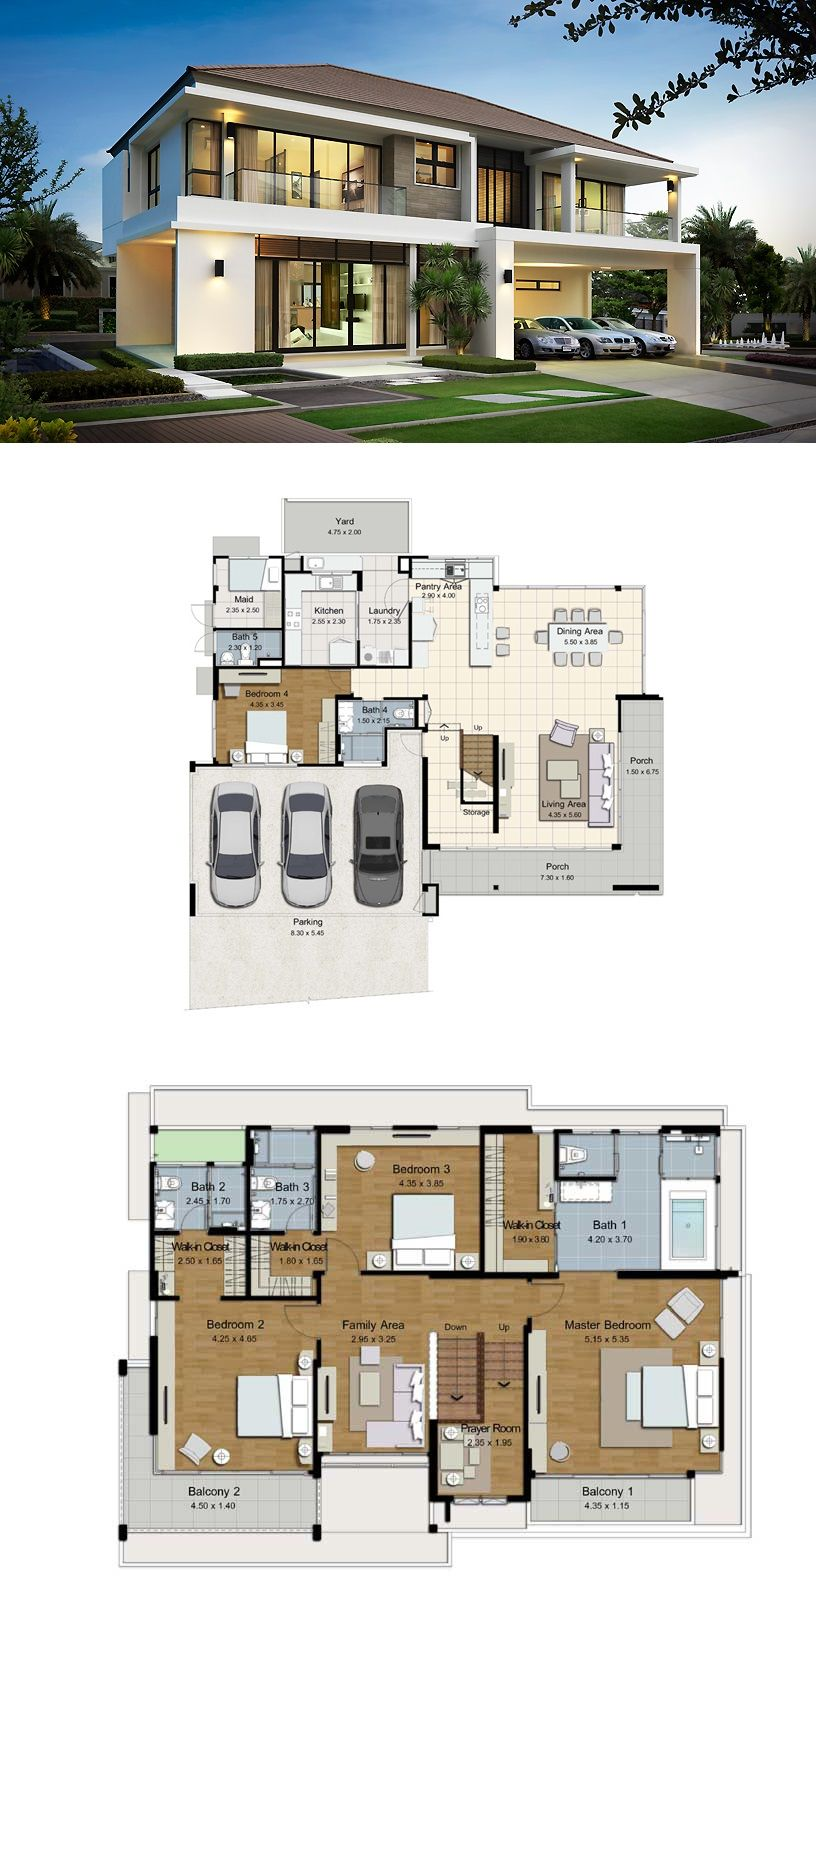 Land And Houses Minimalist House Design Modern House Plans Dream House Plans